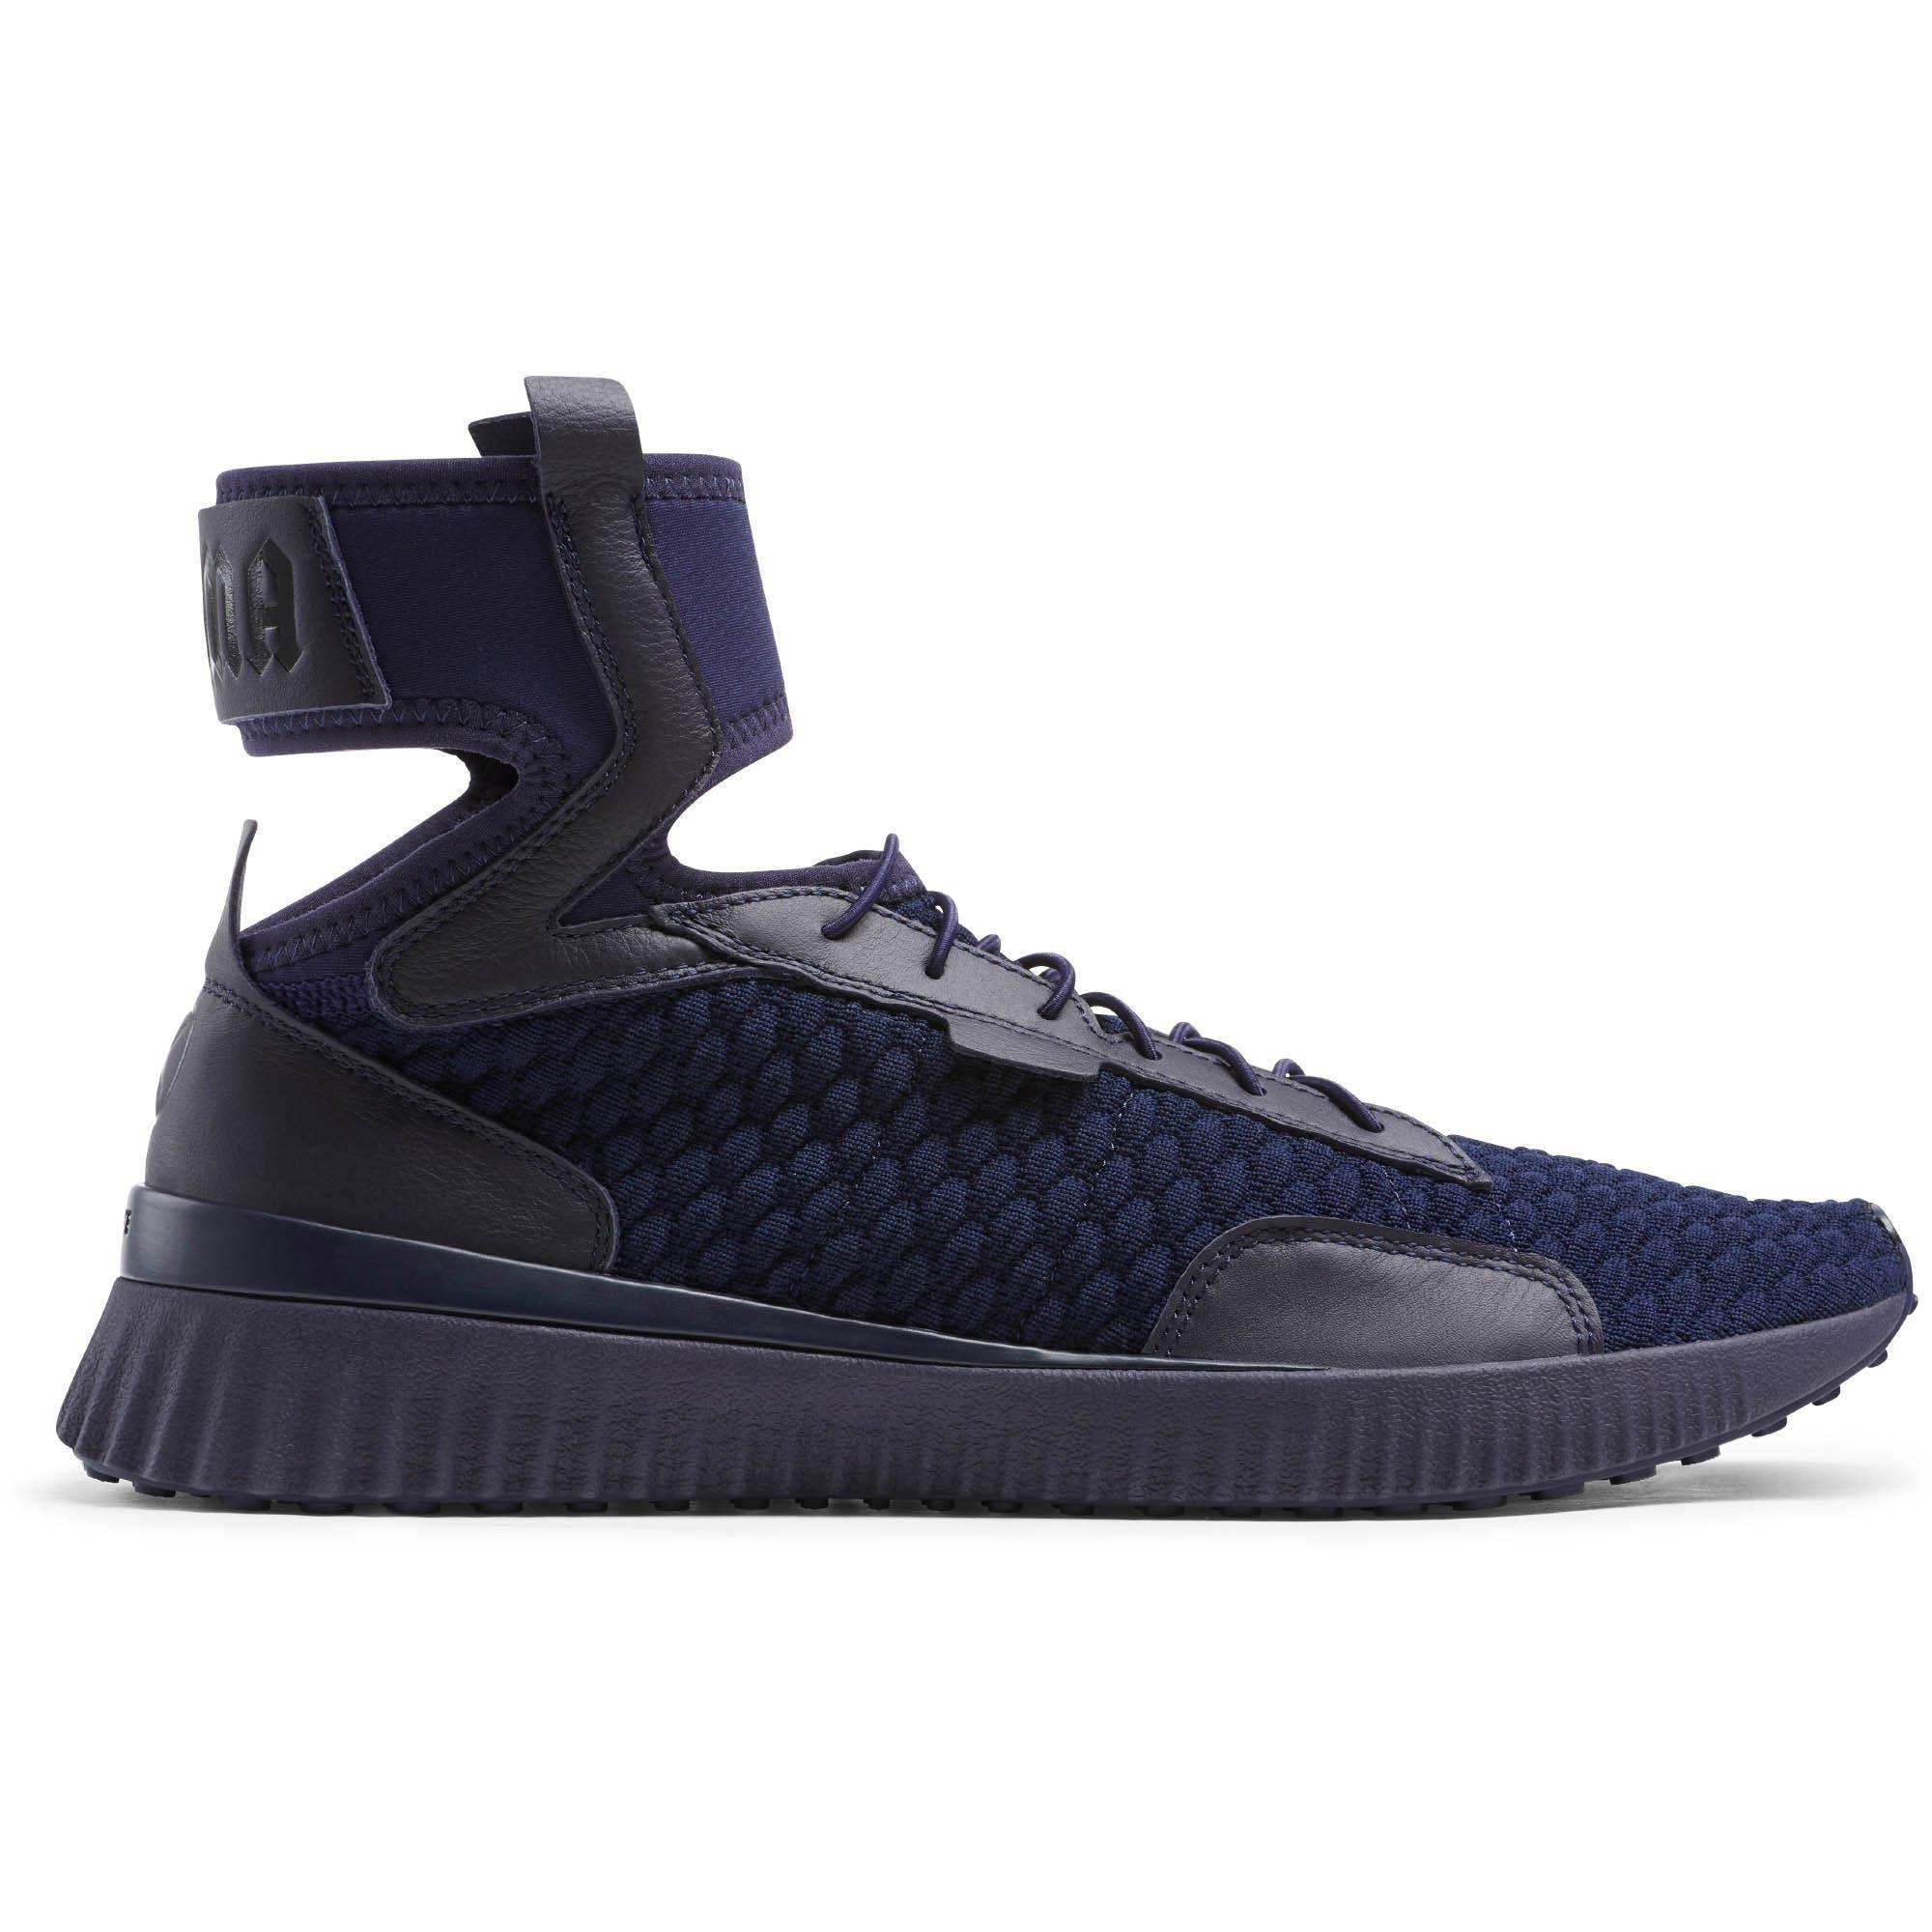 separation shoes 0d213 d2d88 Lyst - PUMA Fenty Trainer Mid Geo Men's Sneakers in Blue for Men